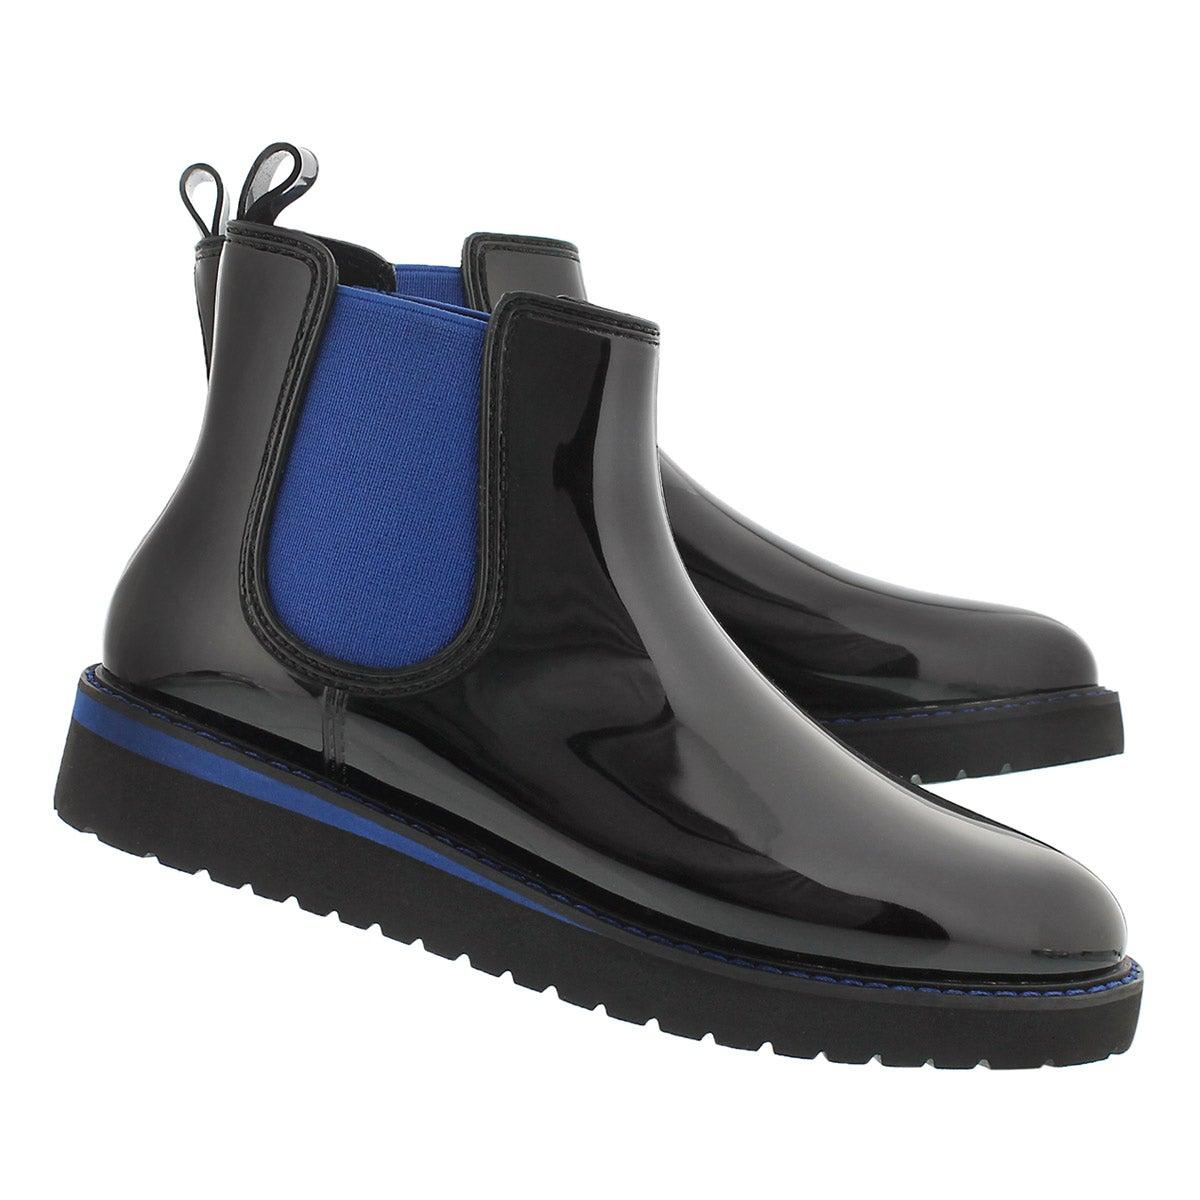 Lds Kensington blk/blu wtpf chelsea boot